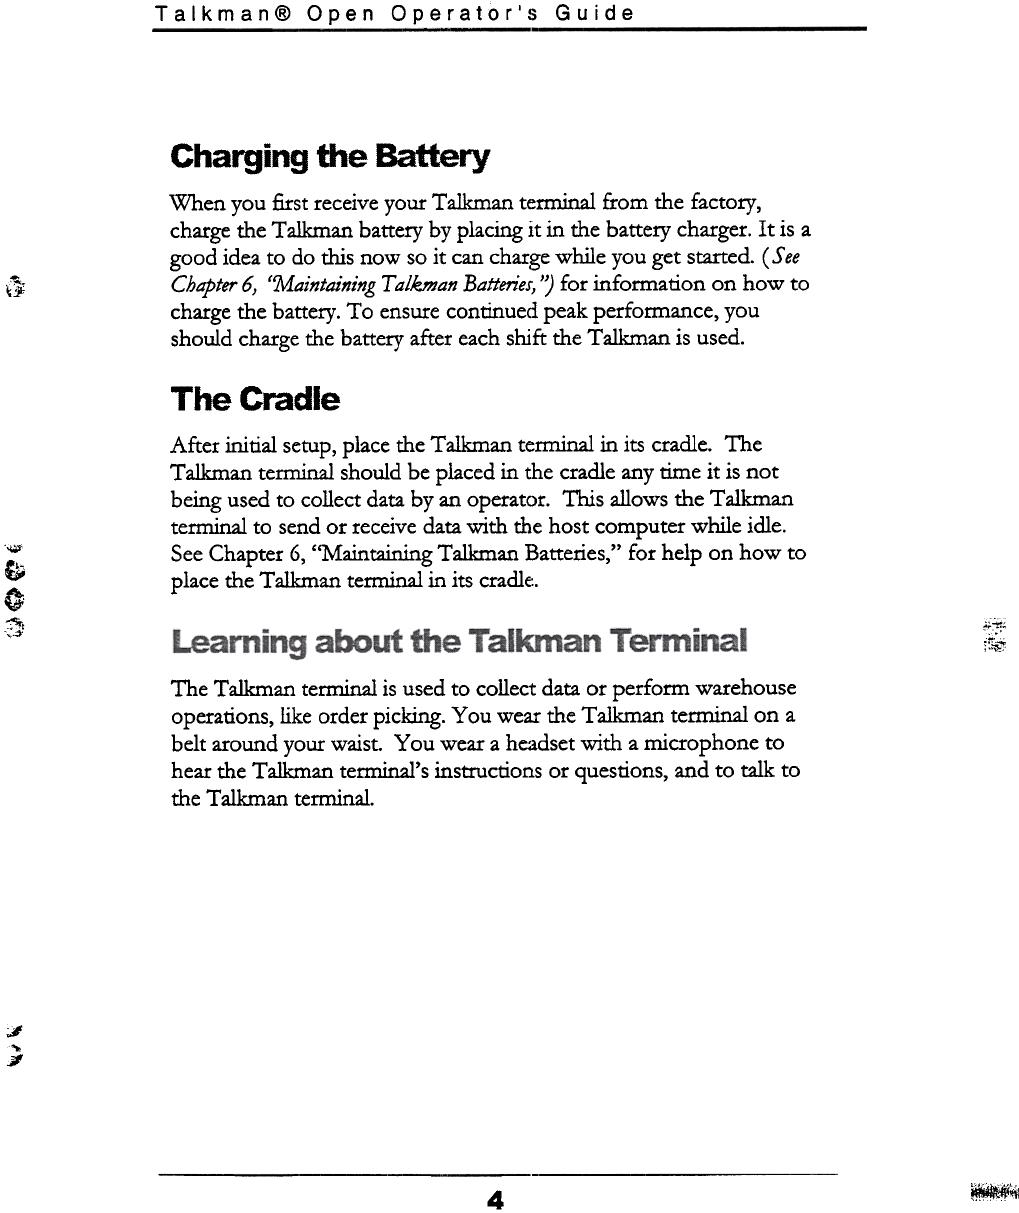 Vocollect Tt500 33300 Talkman Open Apollo Terminal User Manual Part 3 And the author is thetalkman. usermanual wiki